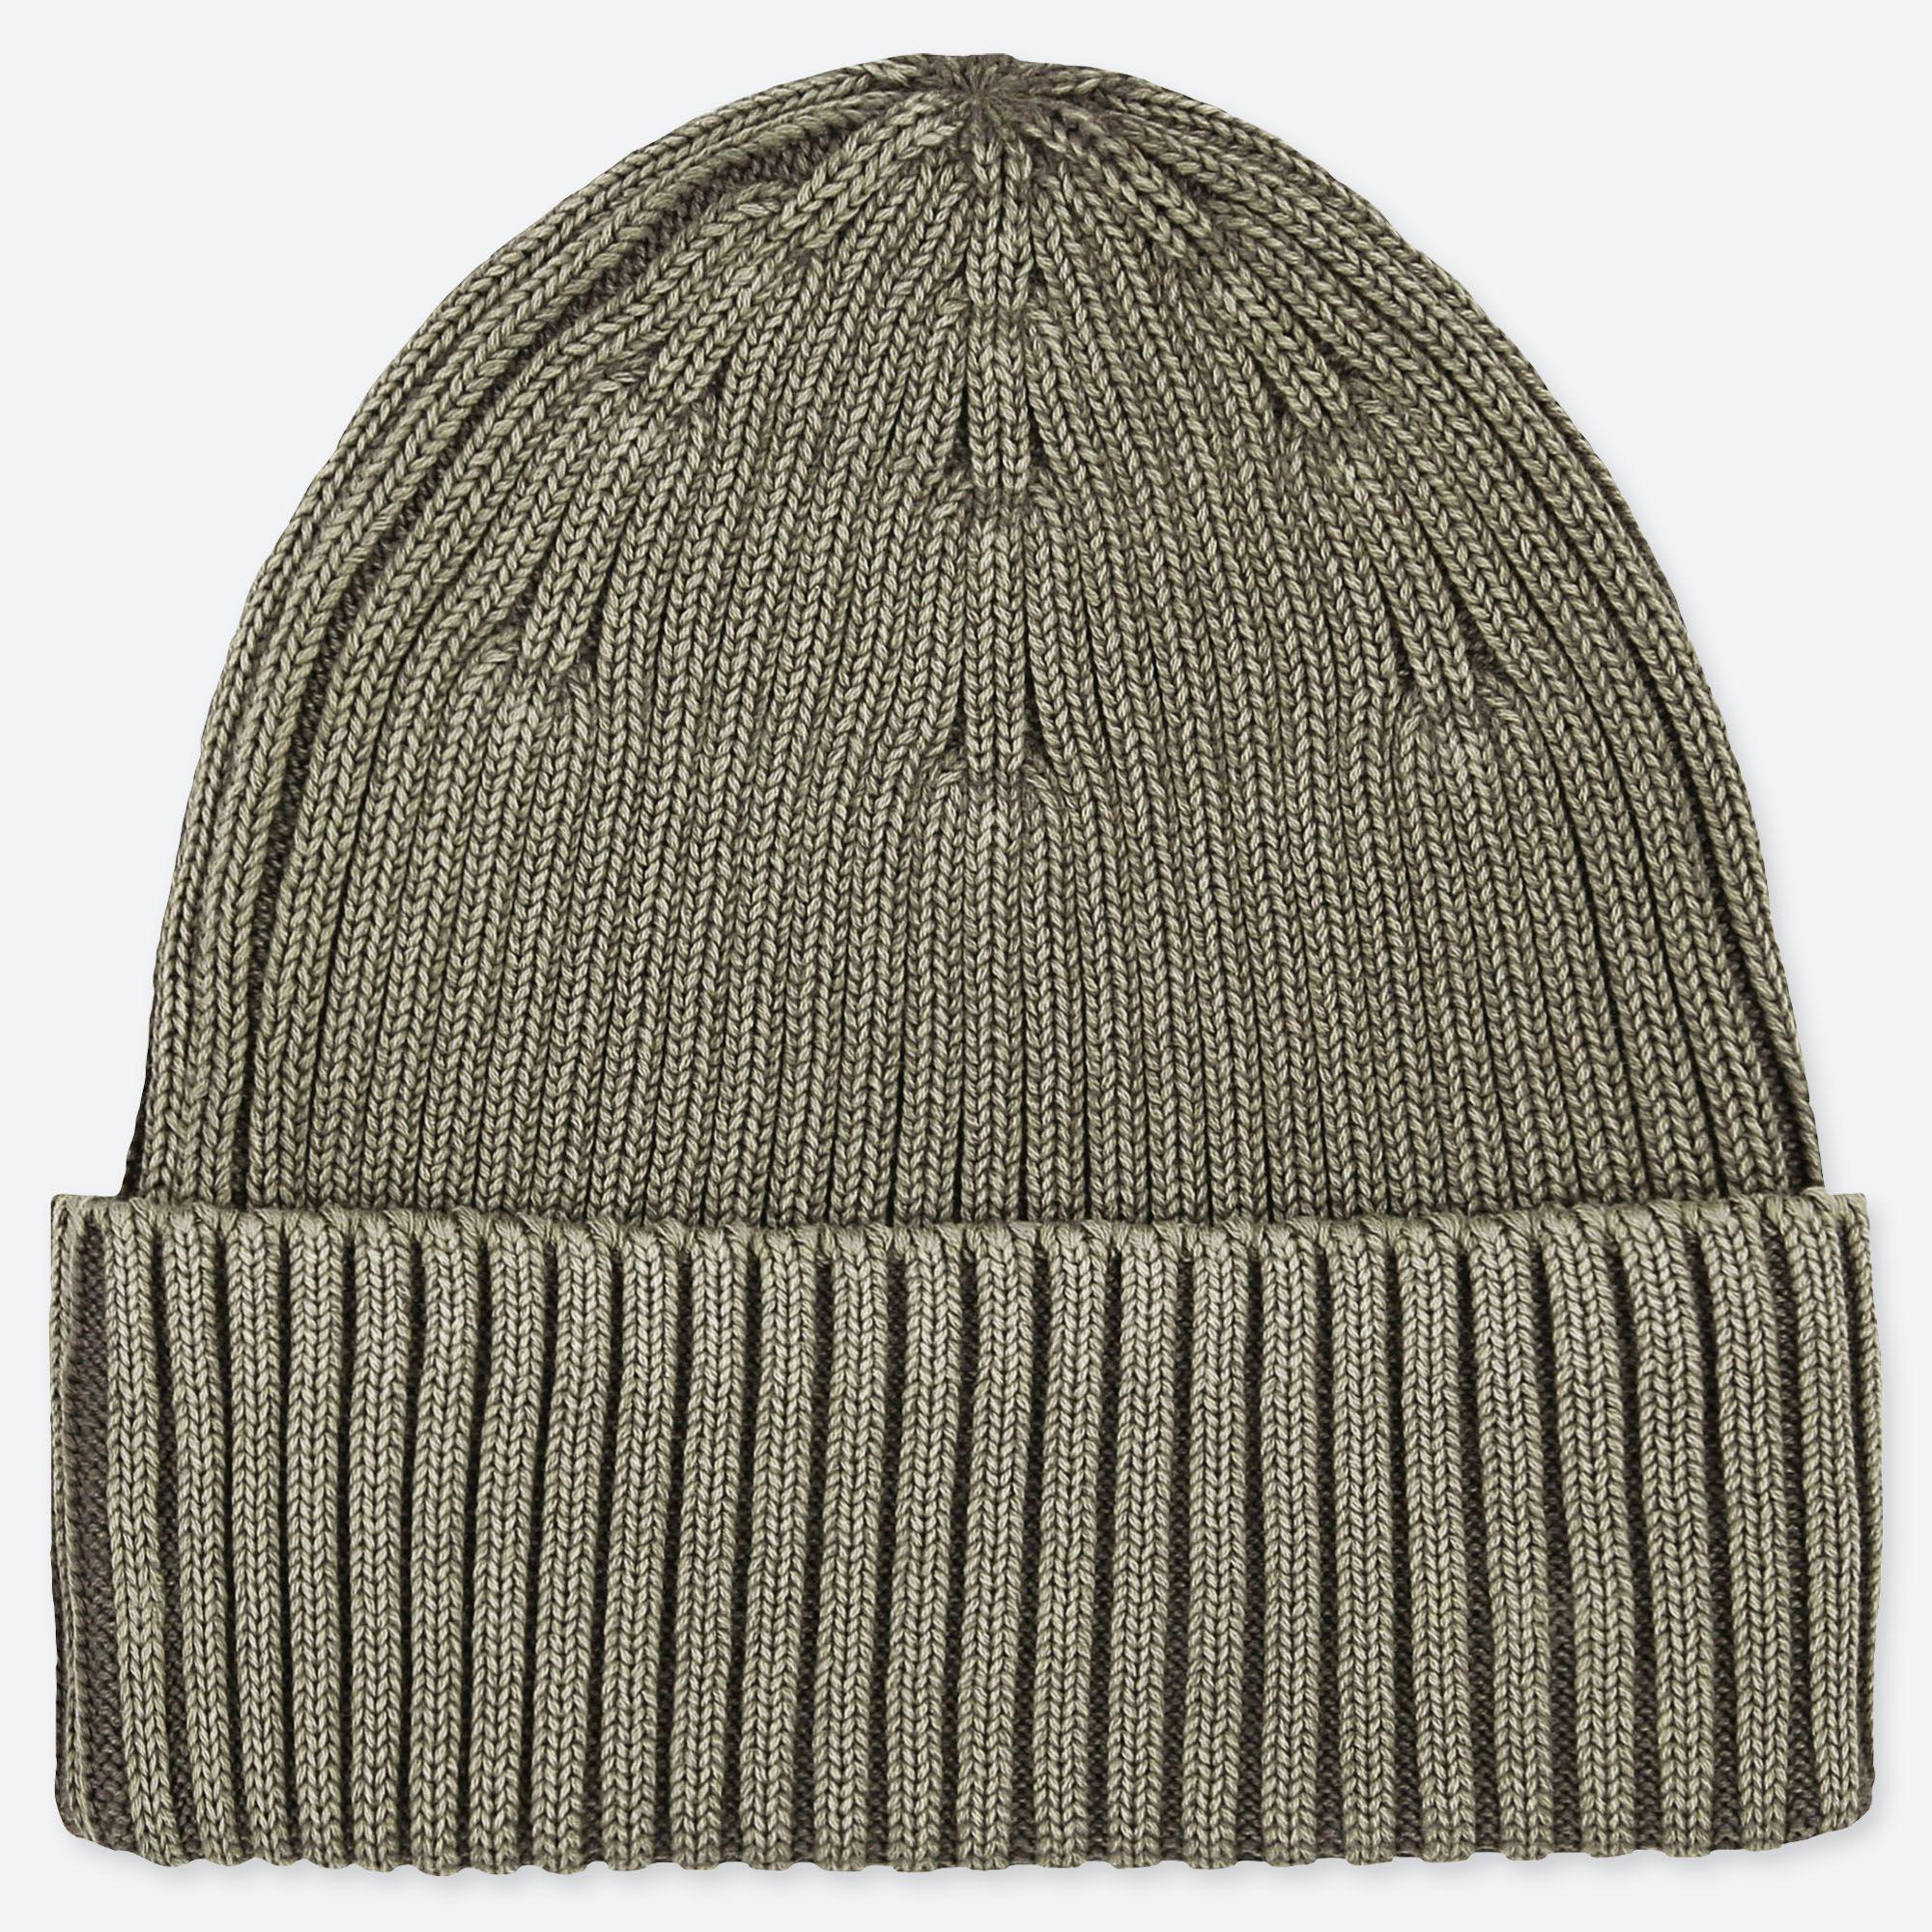 Uniqlo Rib Beanie Hat in Green for Men - Lyst 68f85a19a3f5